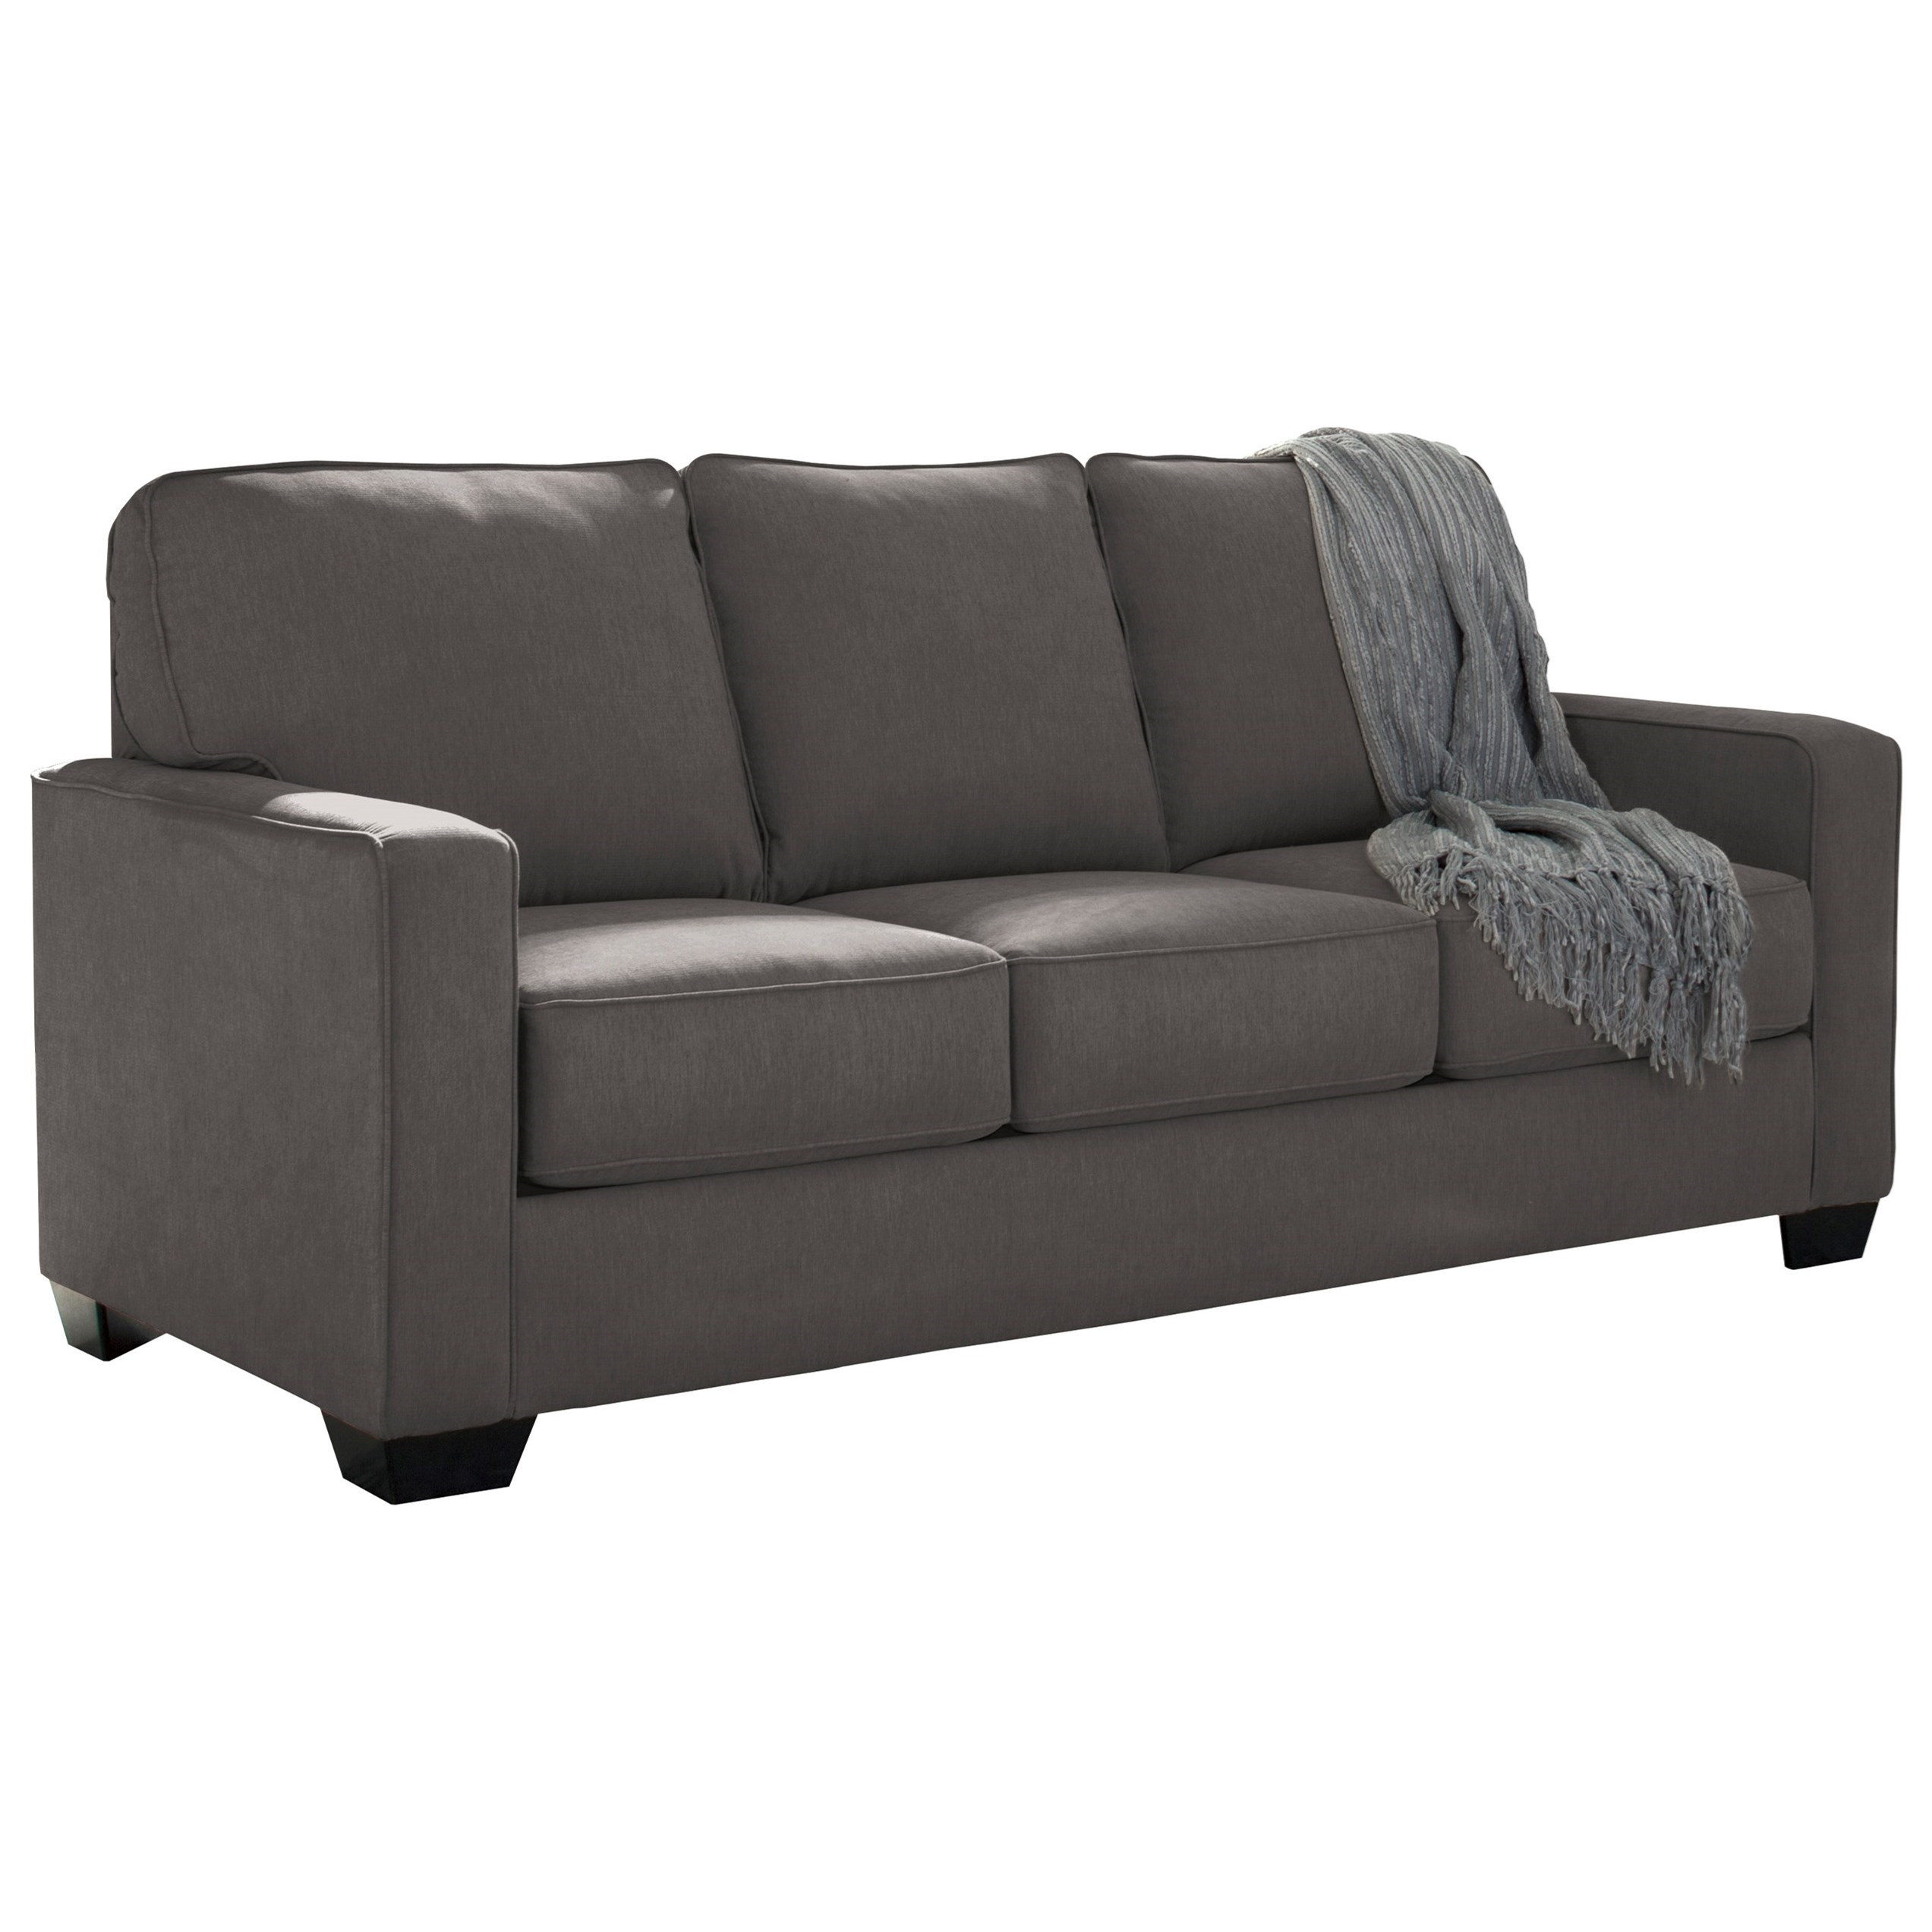 Foam Sleeper Sofa: Full Sofa Sleeper With Memory Foam Mattress By Signature